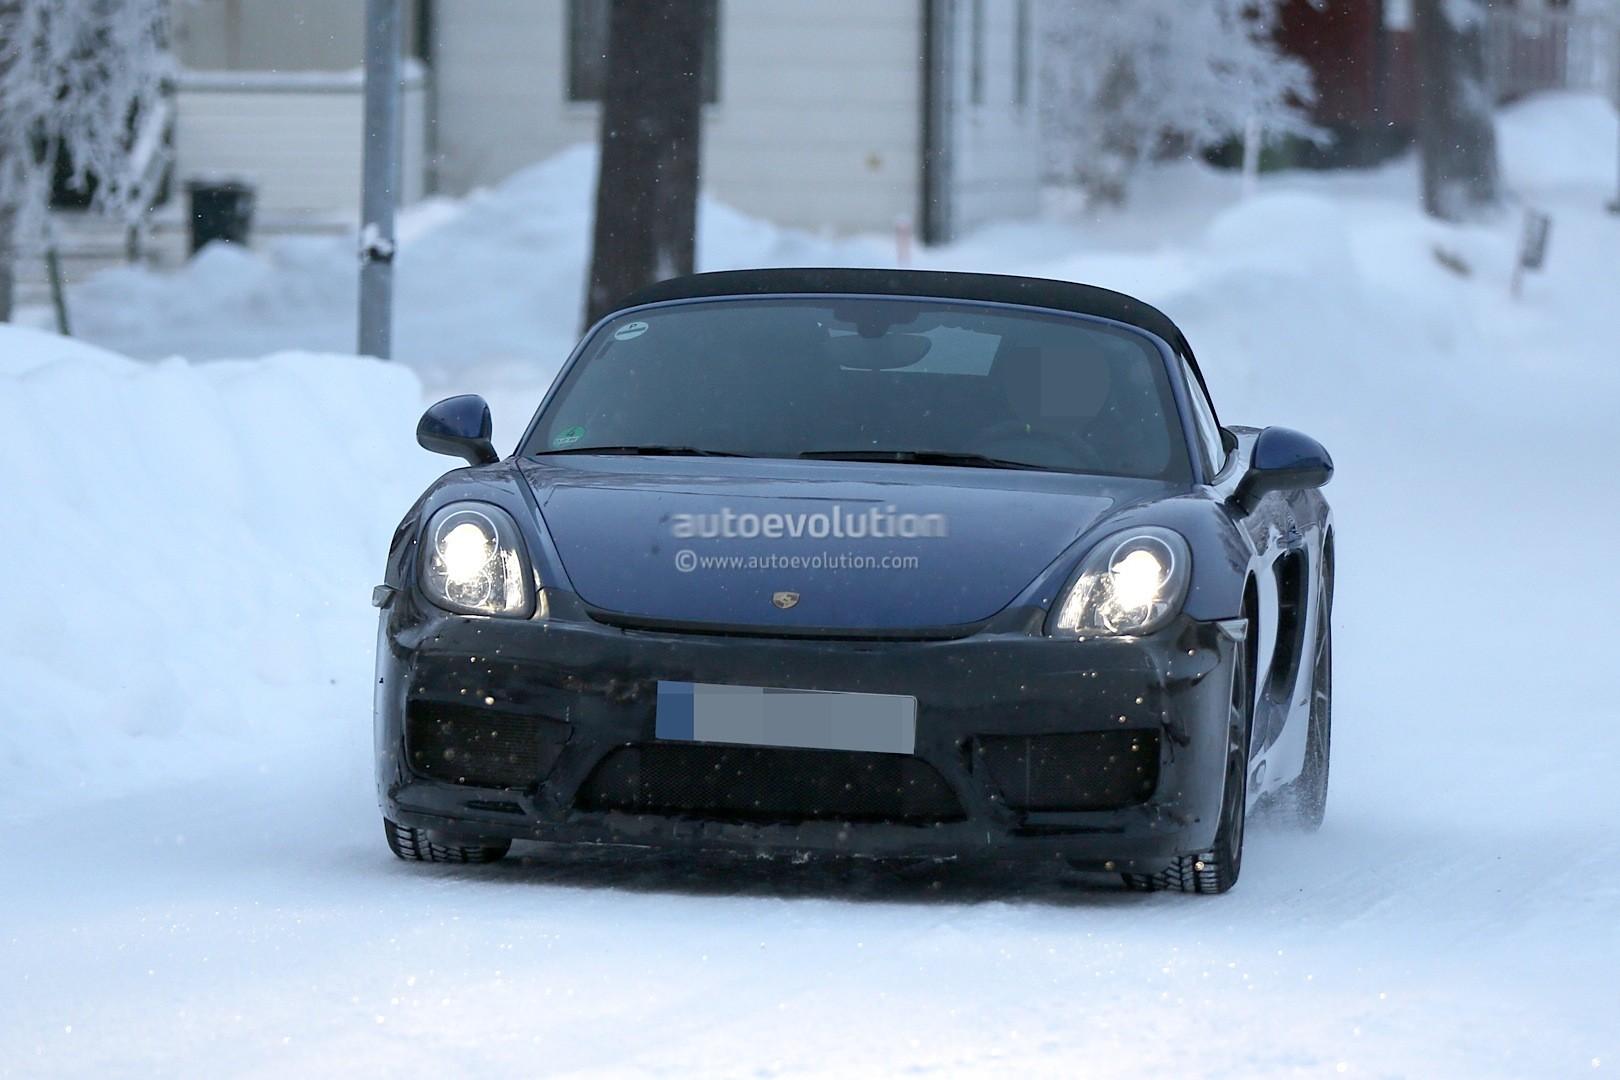 2016 - [Porsche] 718 Boxster & 718 Cayman [982] - Page 2 Spyshots-2016-porsche-boxster-rs-spyder-shows-ducktail-spoiler-aggressive-bumper_1